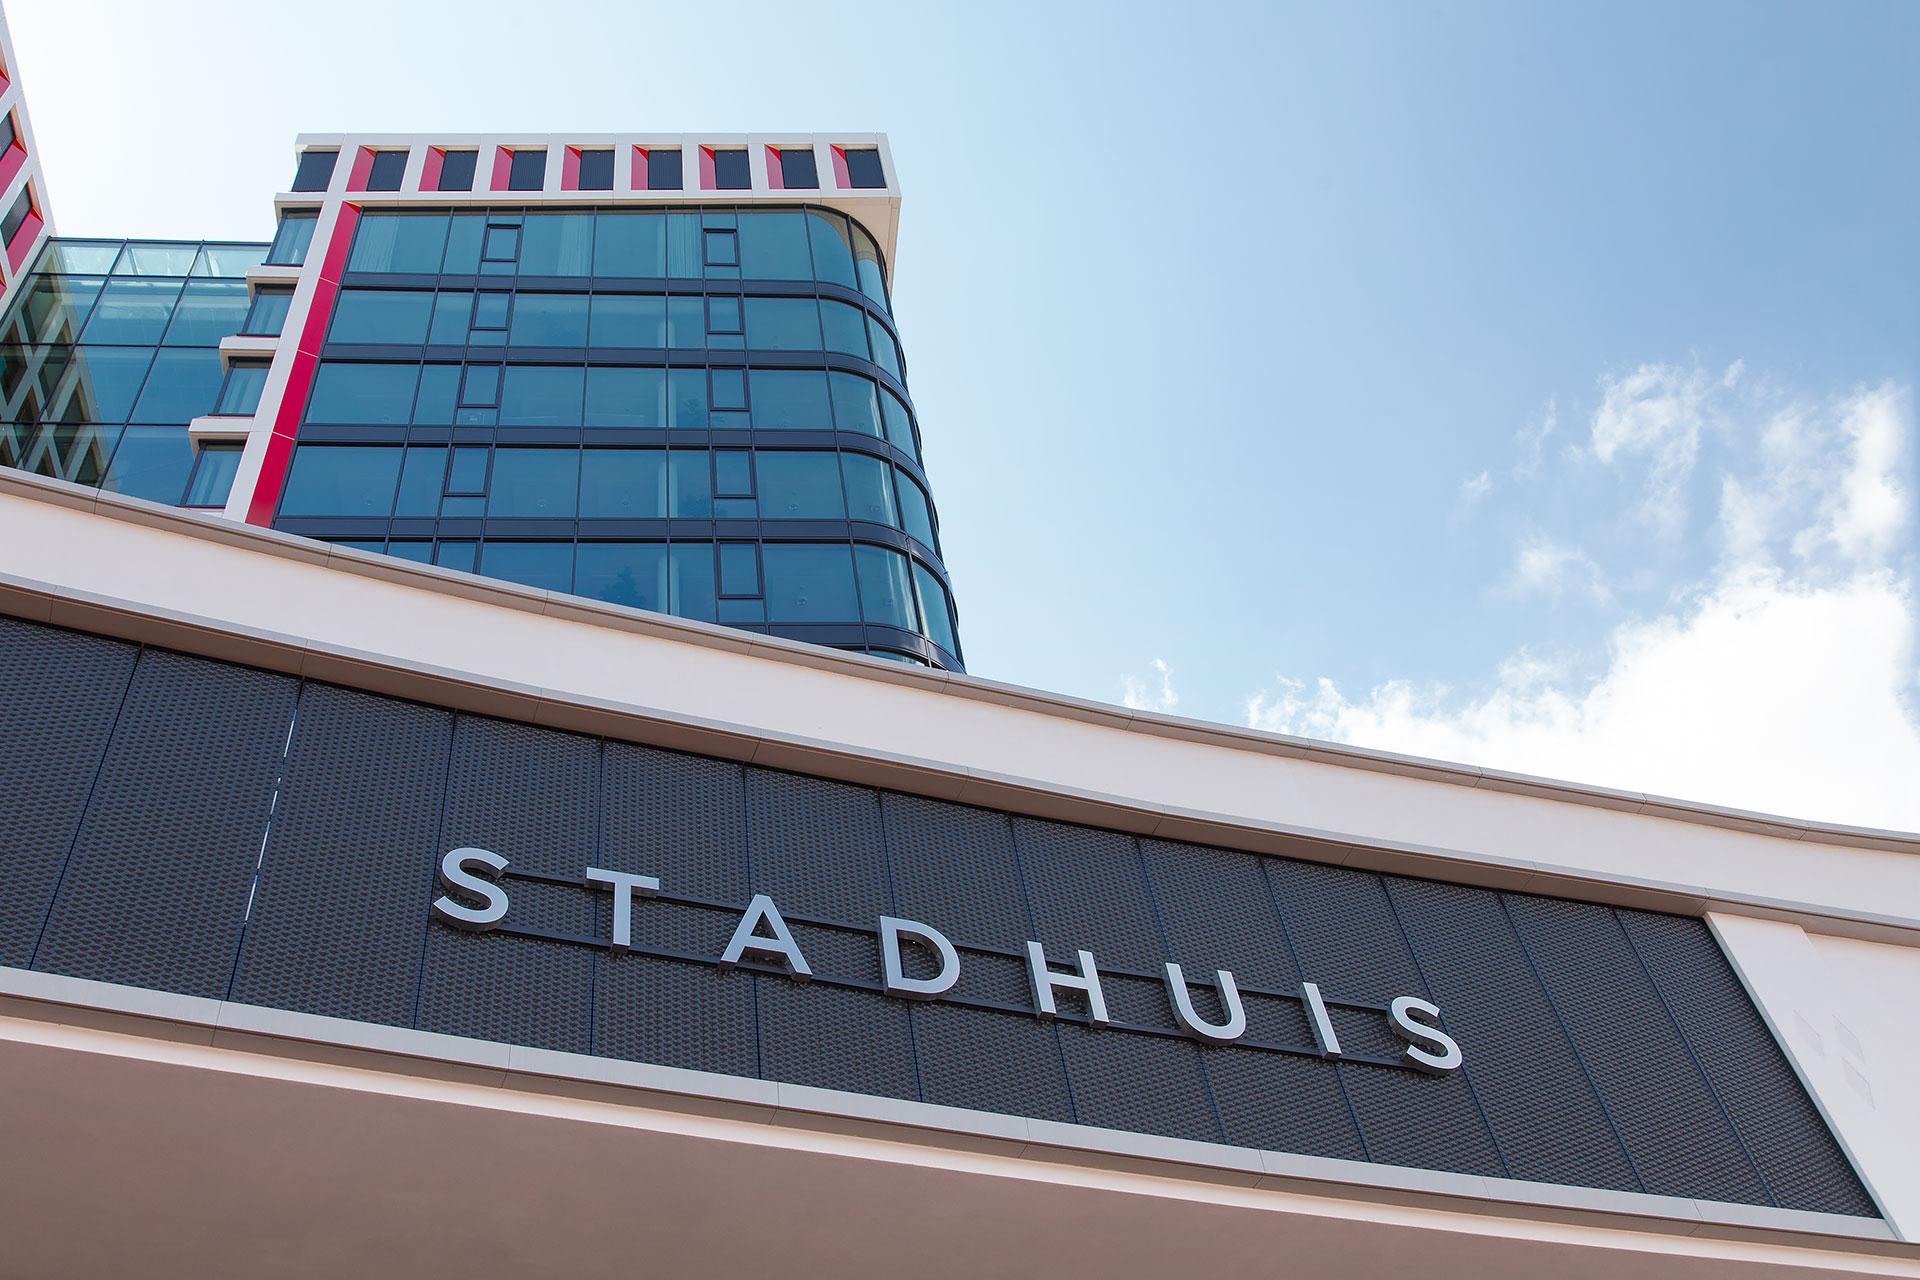 SP2015-Stadhuis-Almelo-architectuurfoto-06